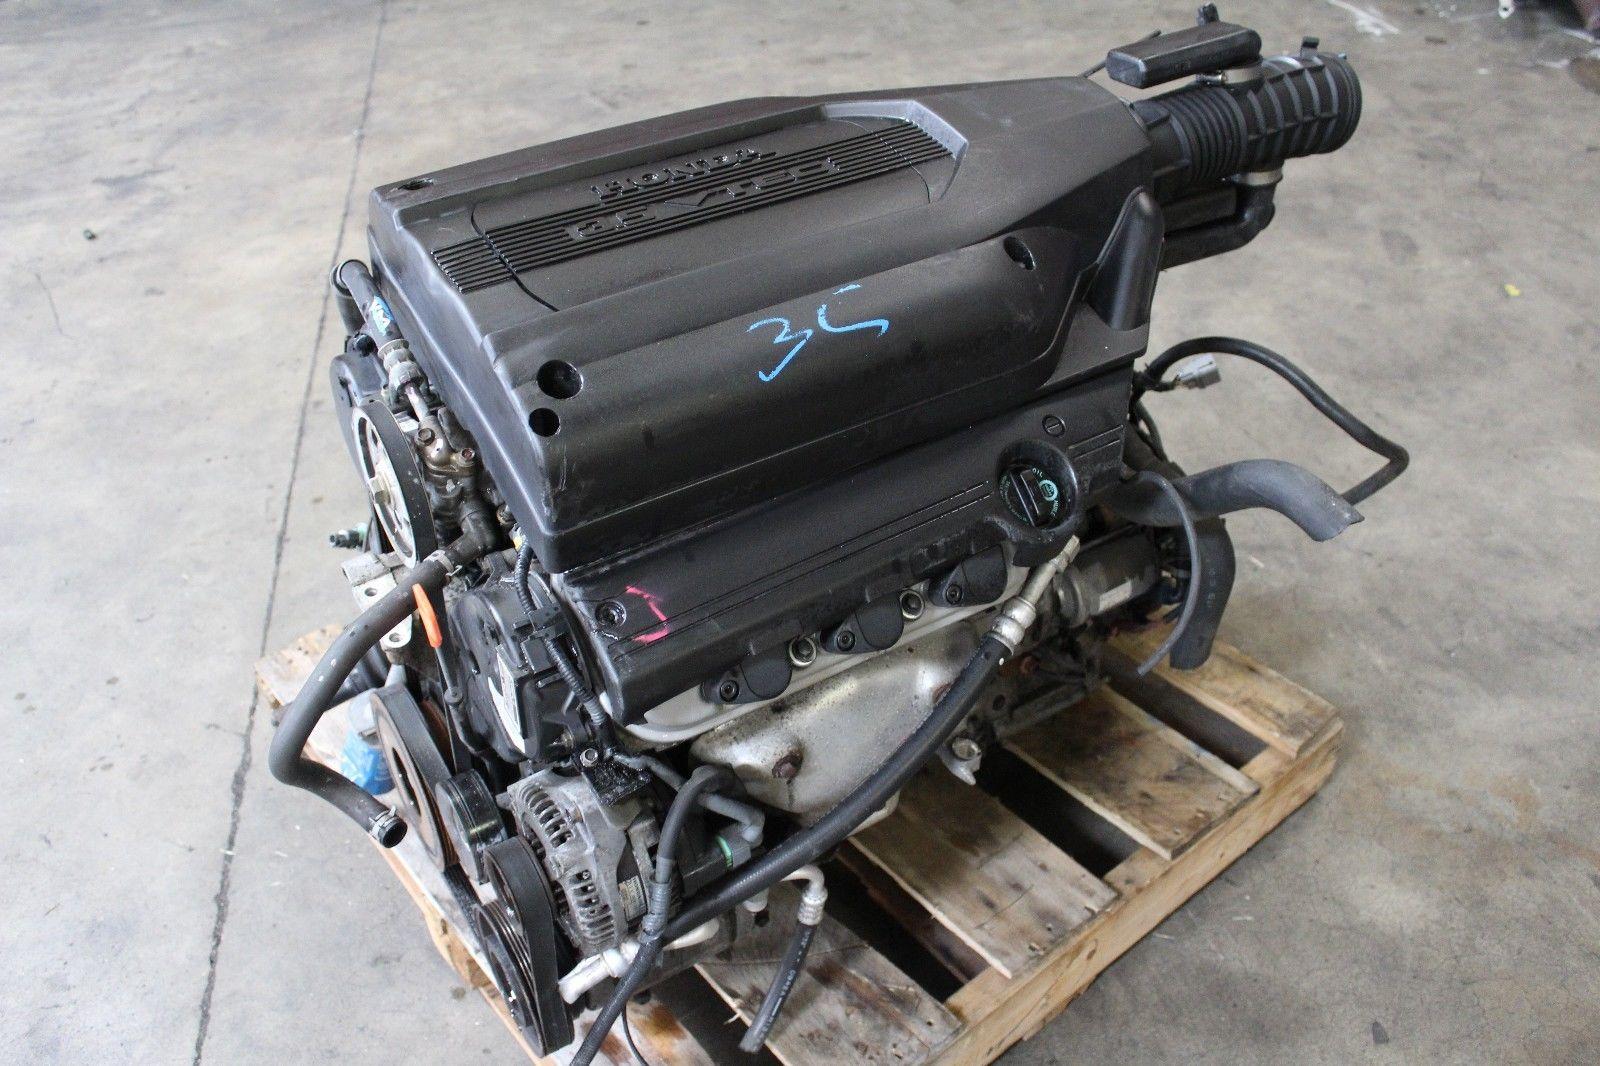 Honda Pilot Rebuilt Used Engines J35a4 J35a6 J35a9